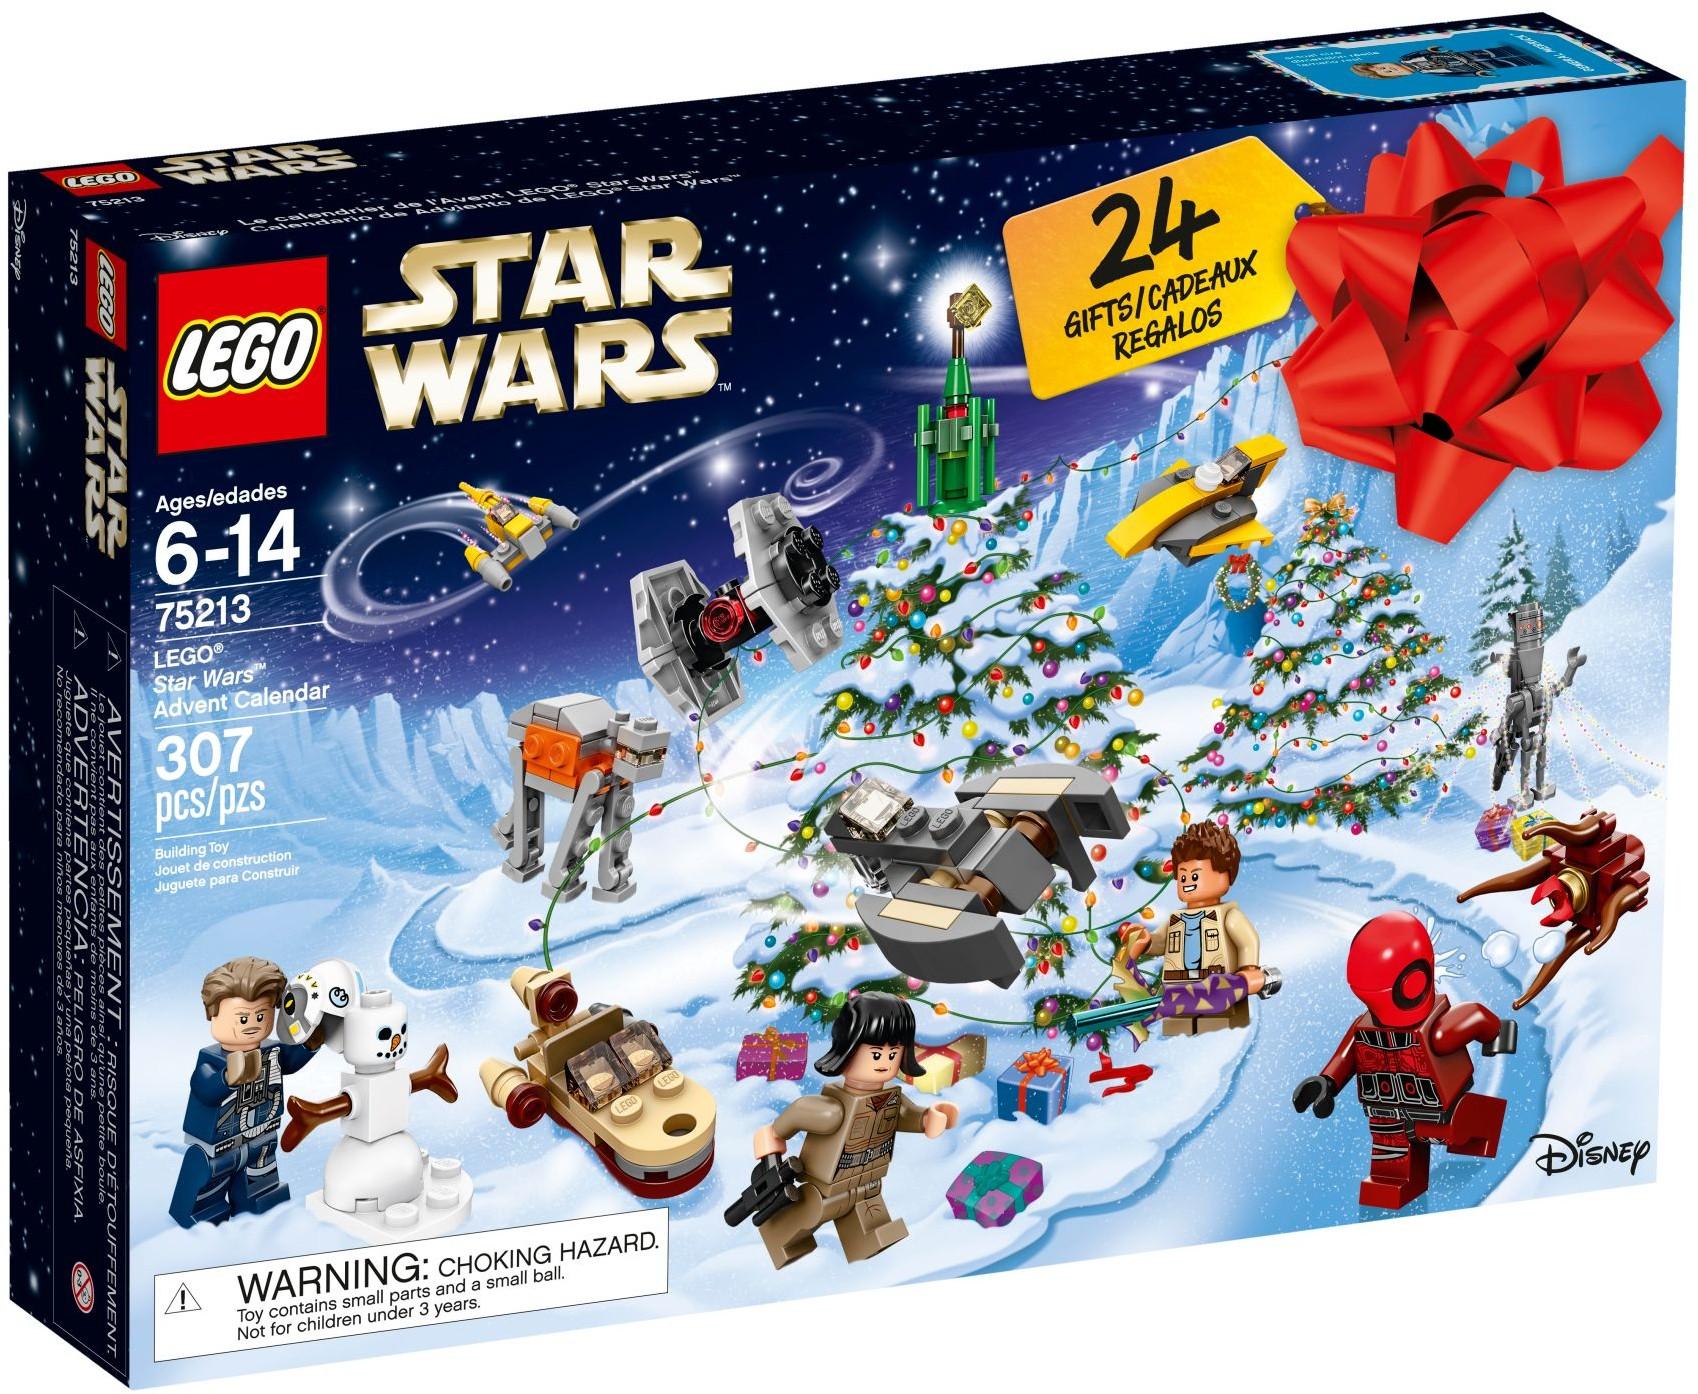 2018 Lego Advent Calendars Now Available At Shop Lego Com